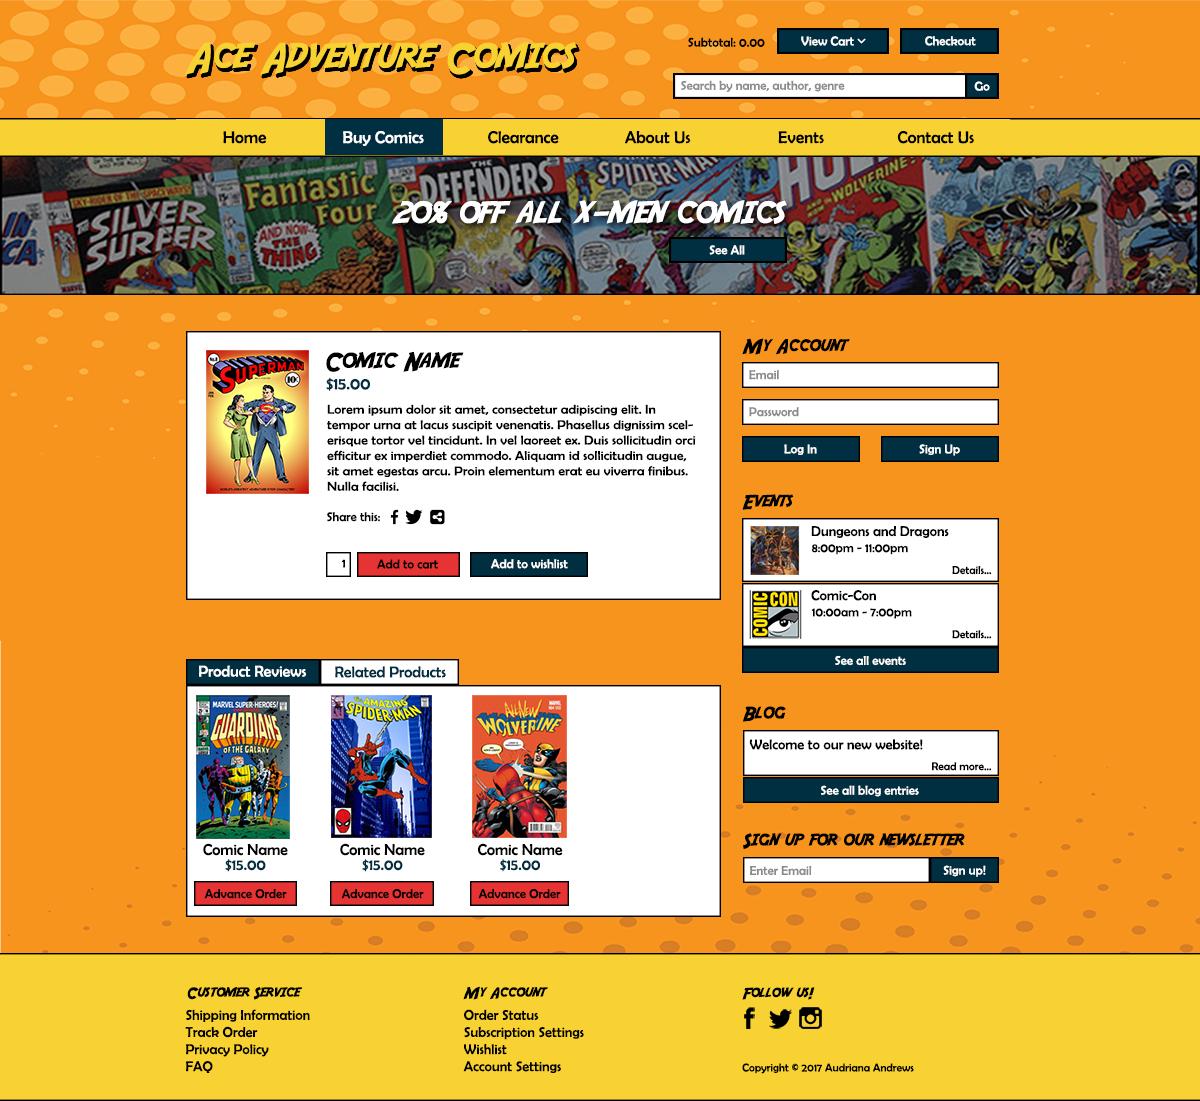 photoshop,Comic Book Store,Web Design